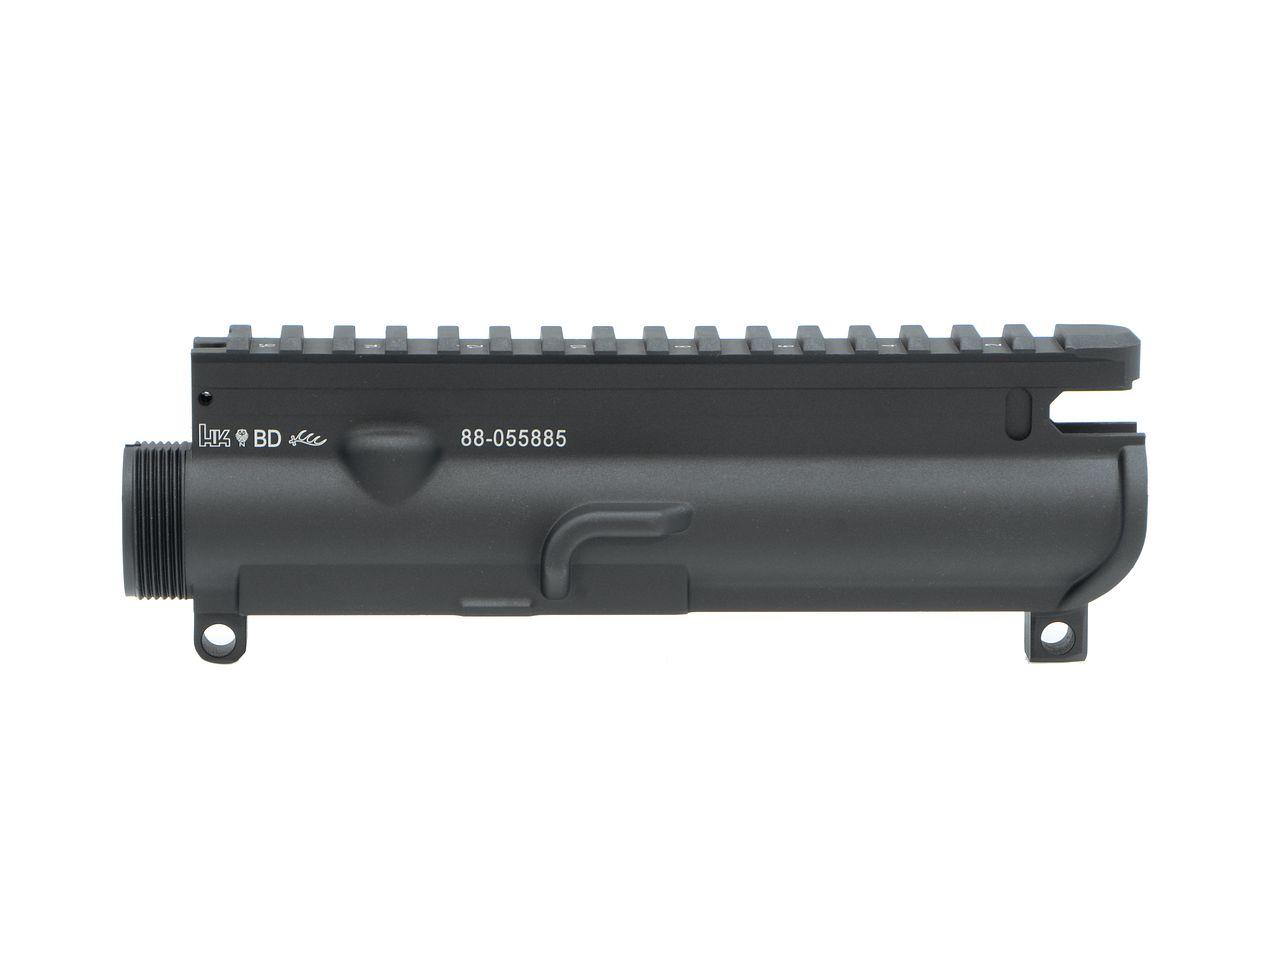 VFC HK416A5 GBBR/01-04 アッパーレシーバー